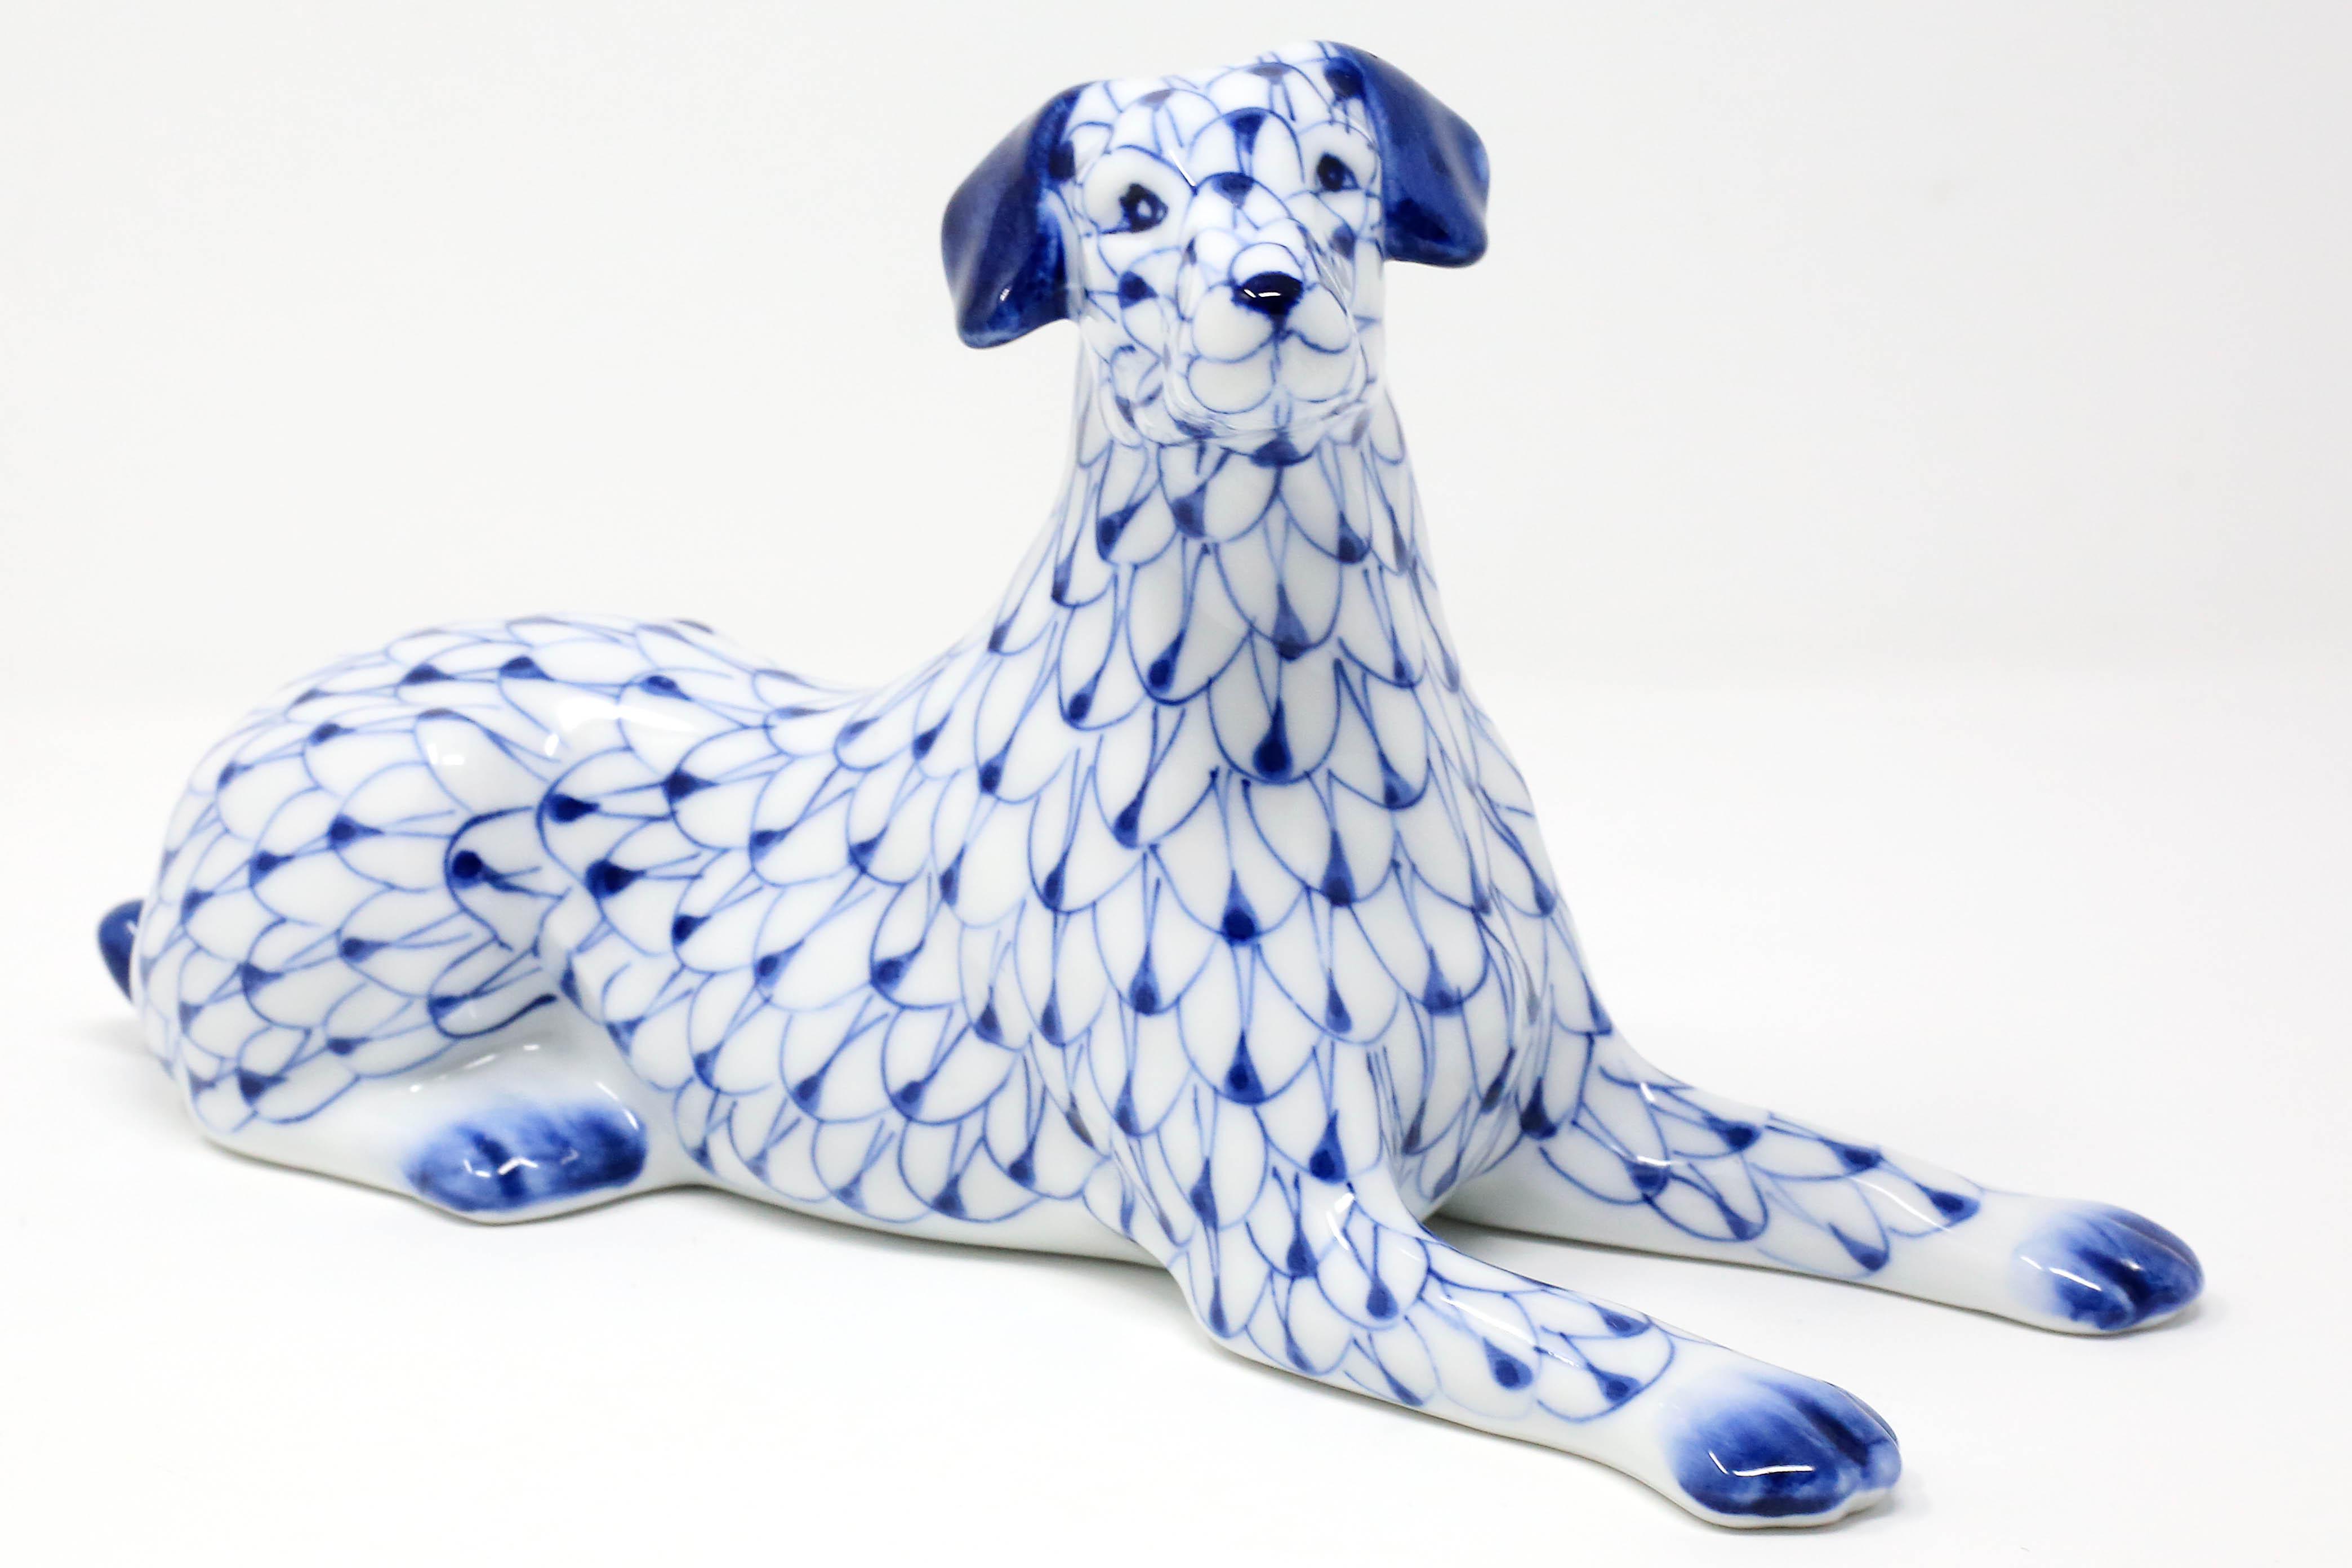 Vintage Blue and White Dog Ring Holder Figurine